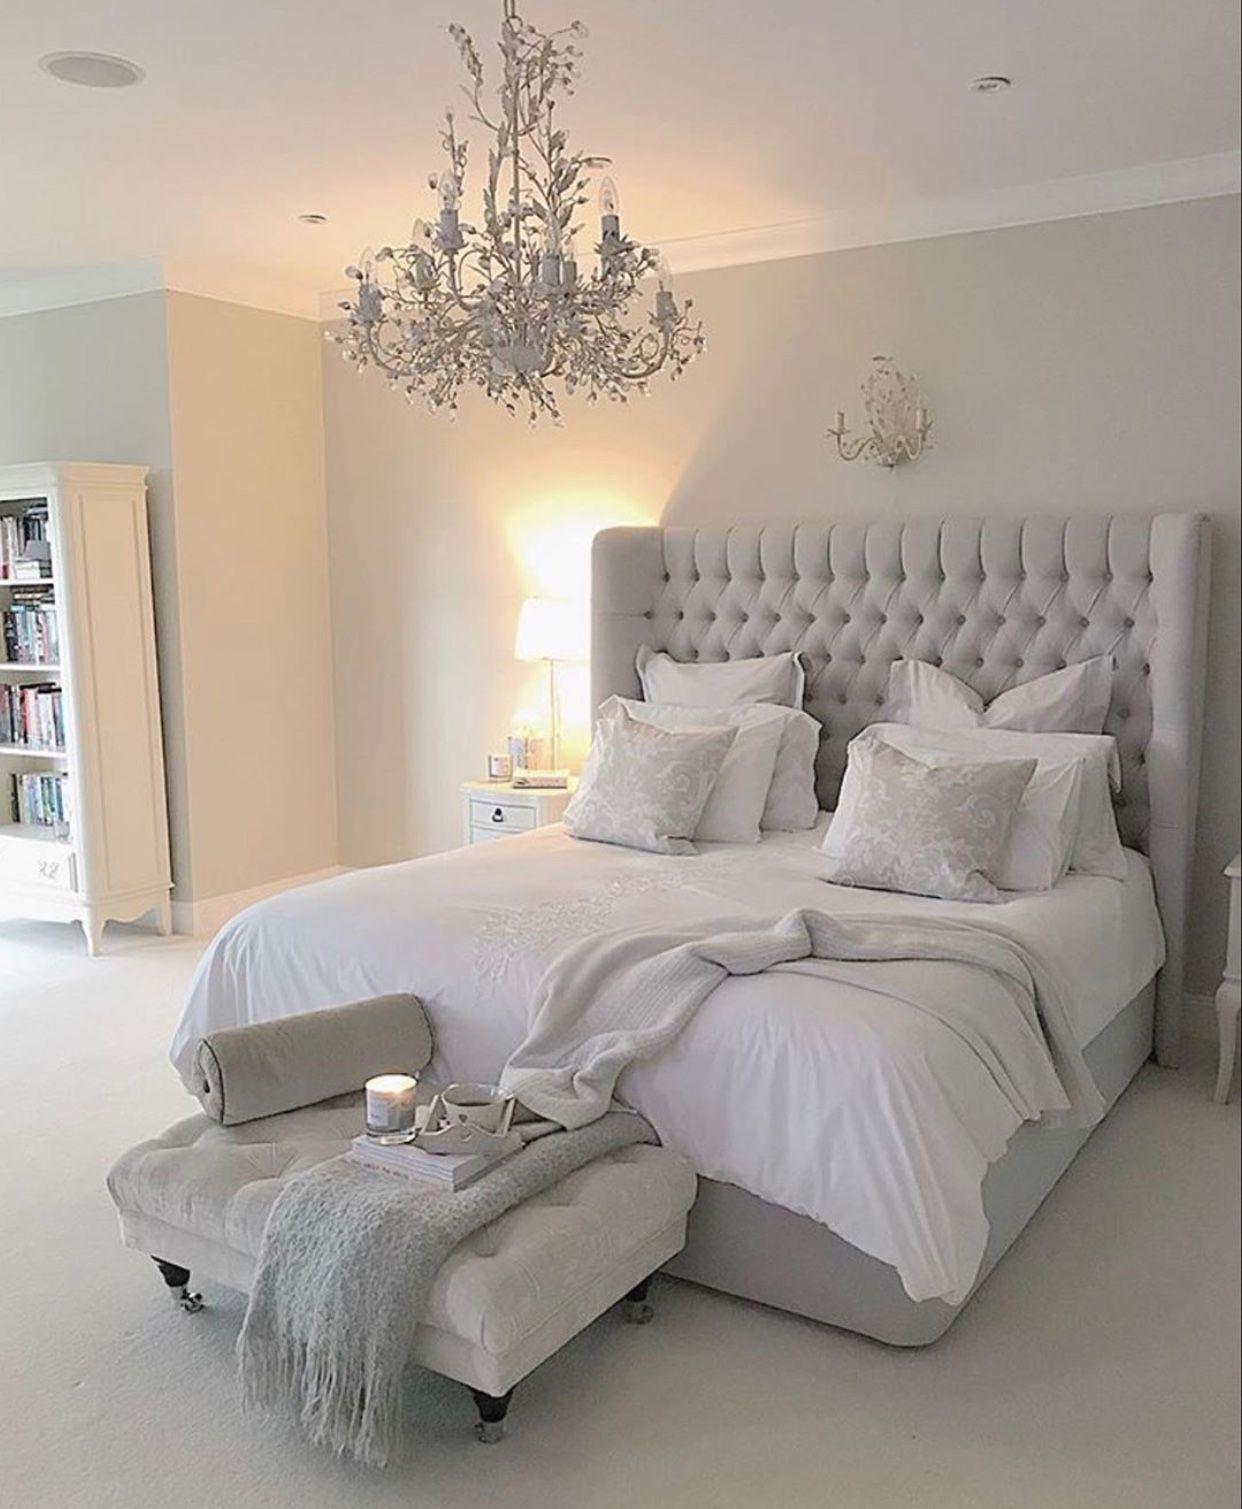 Bedroom #lbloggers #fblchat #fbloggers #bbloggers  Serene bedroom